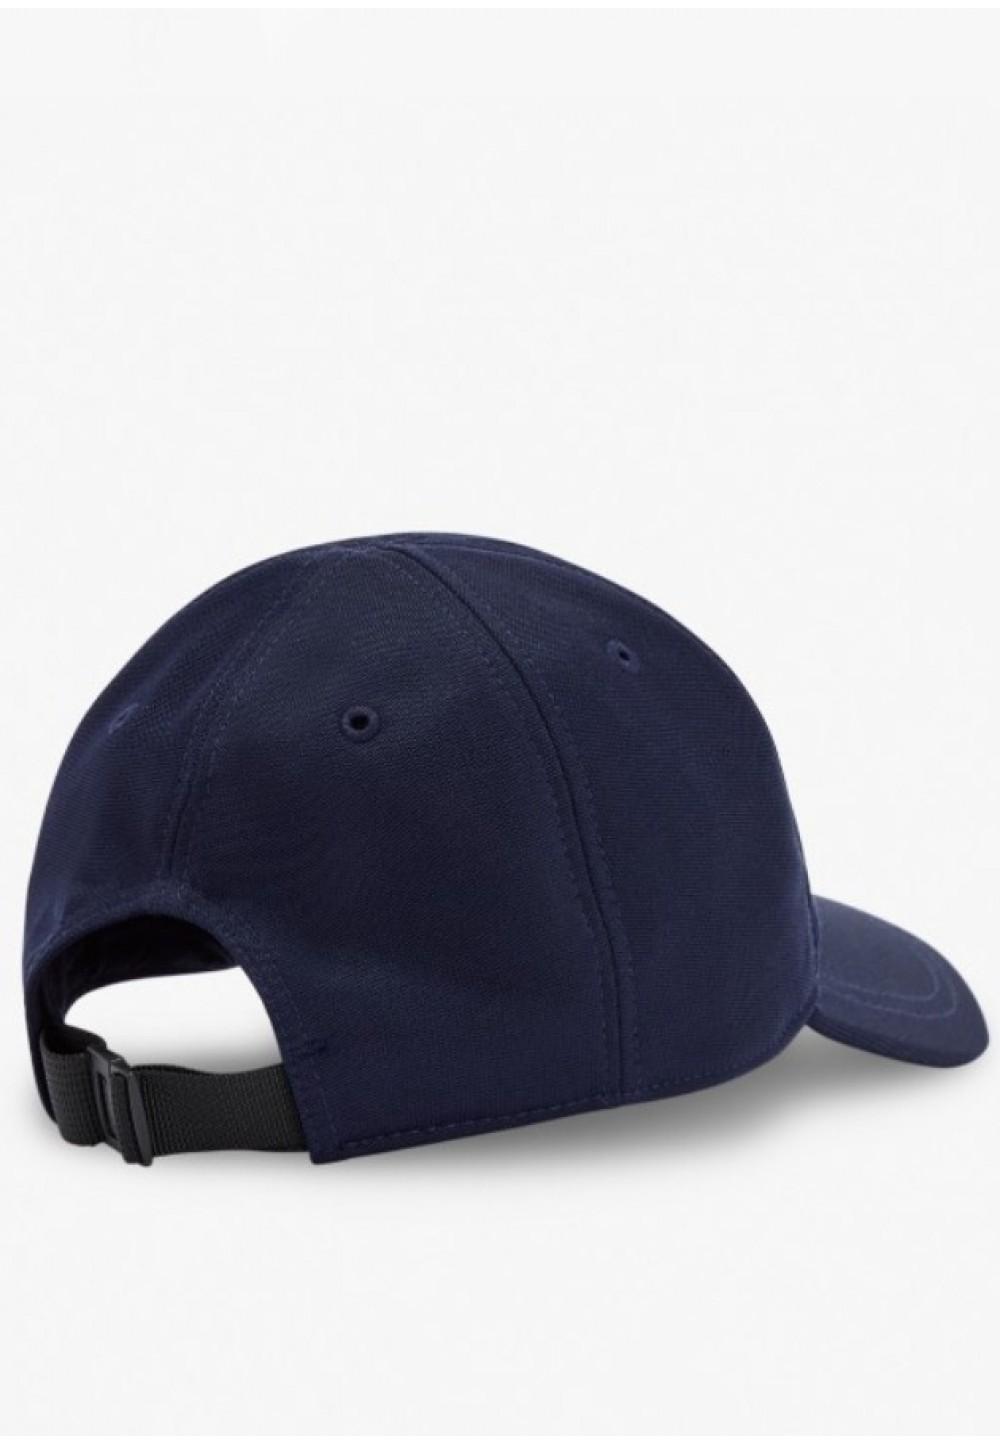 Трикотажна кепка  iз вишивкою бренду